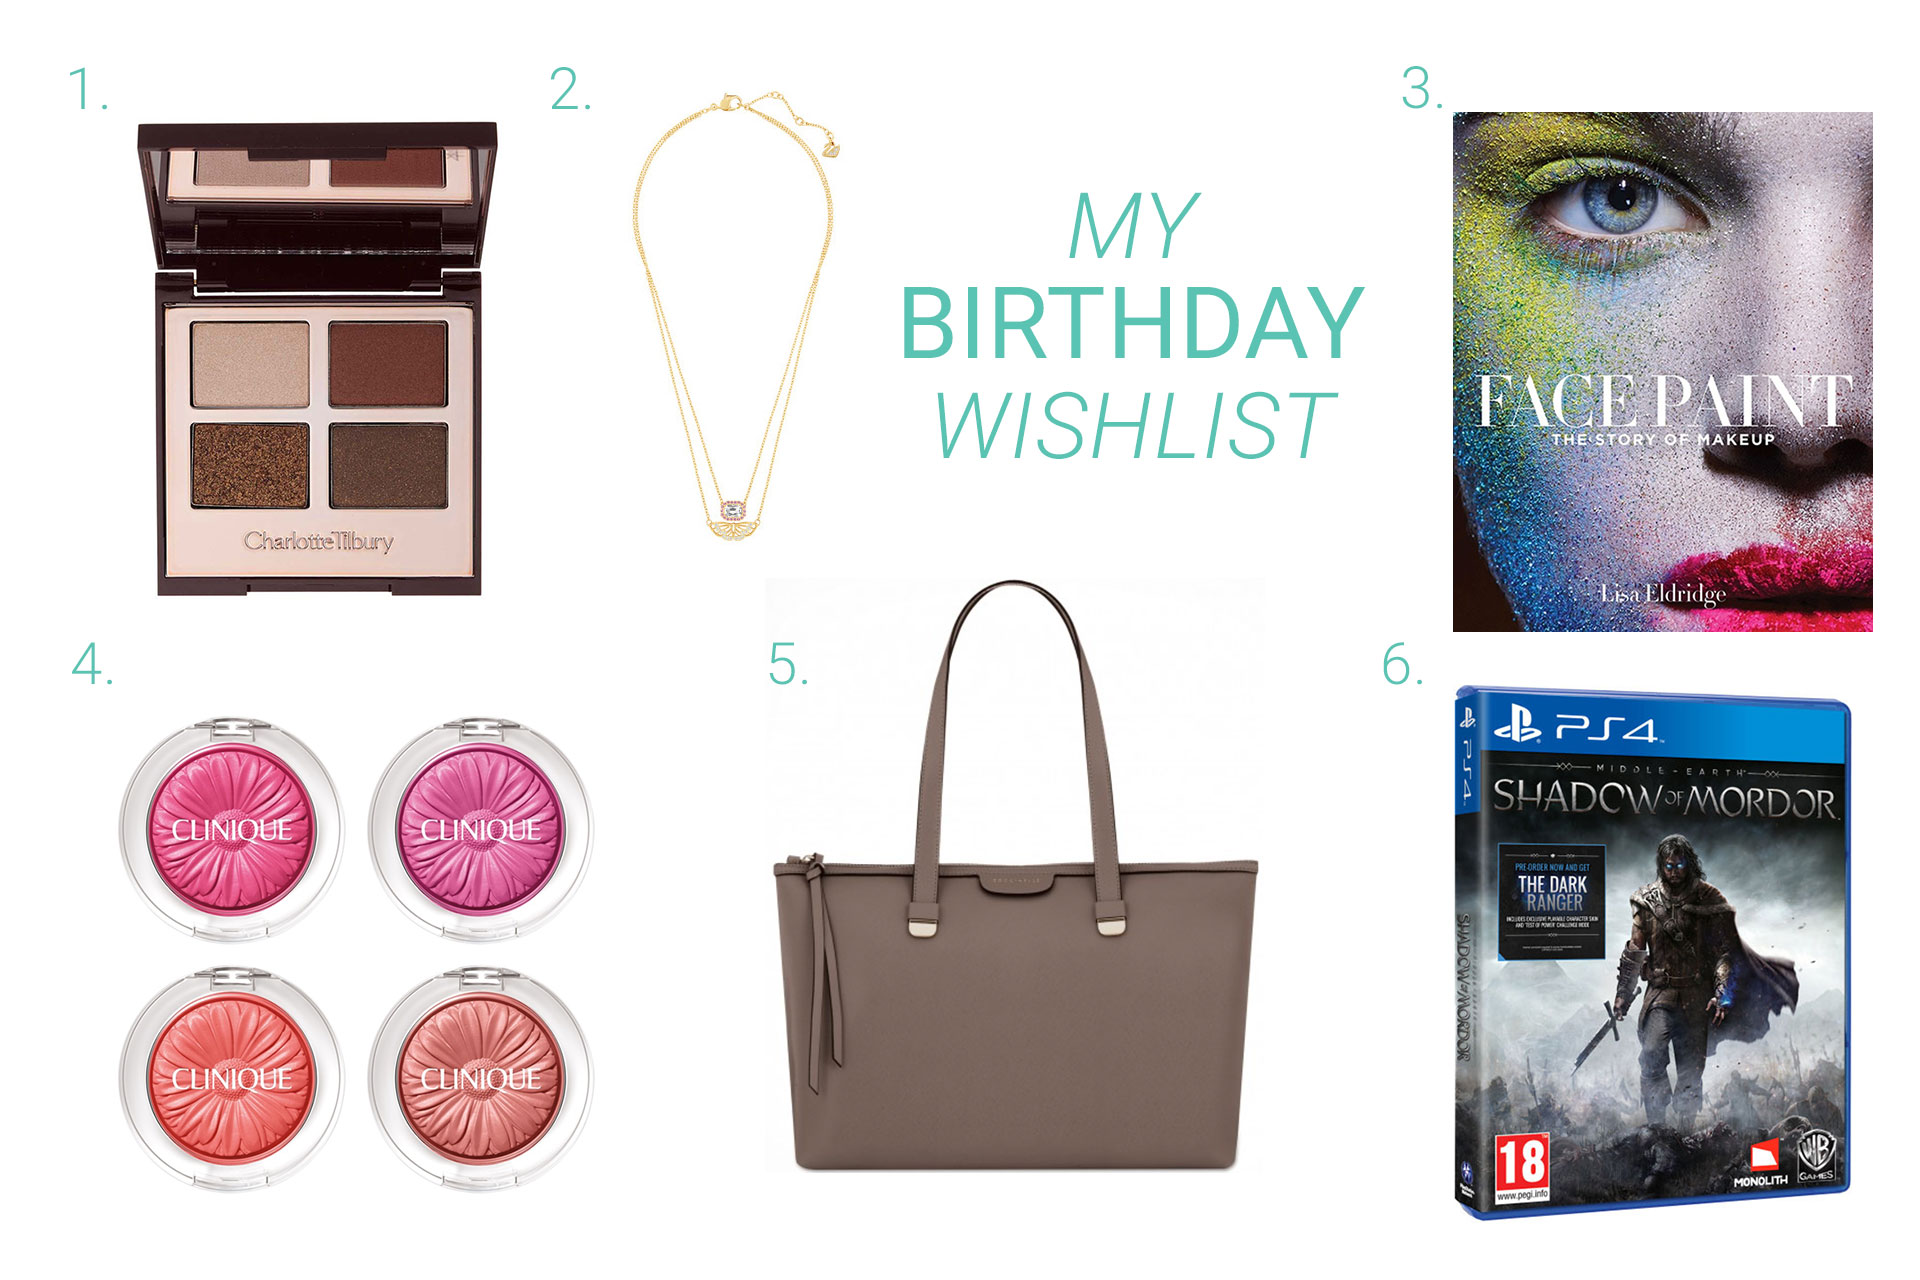 I Have Finally Put My Amazon Wish List Together